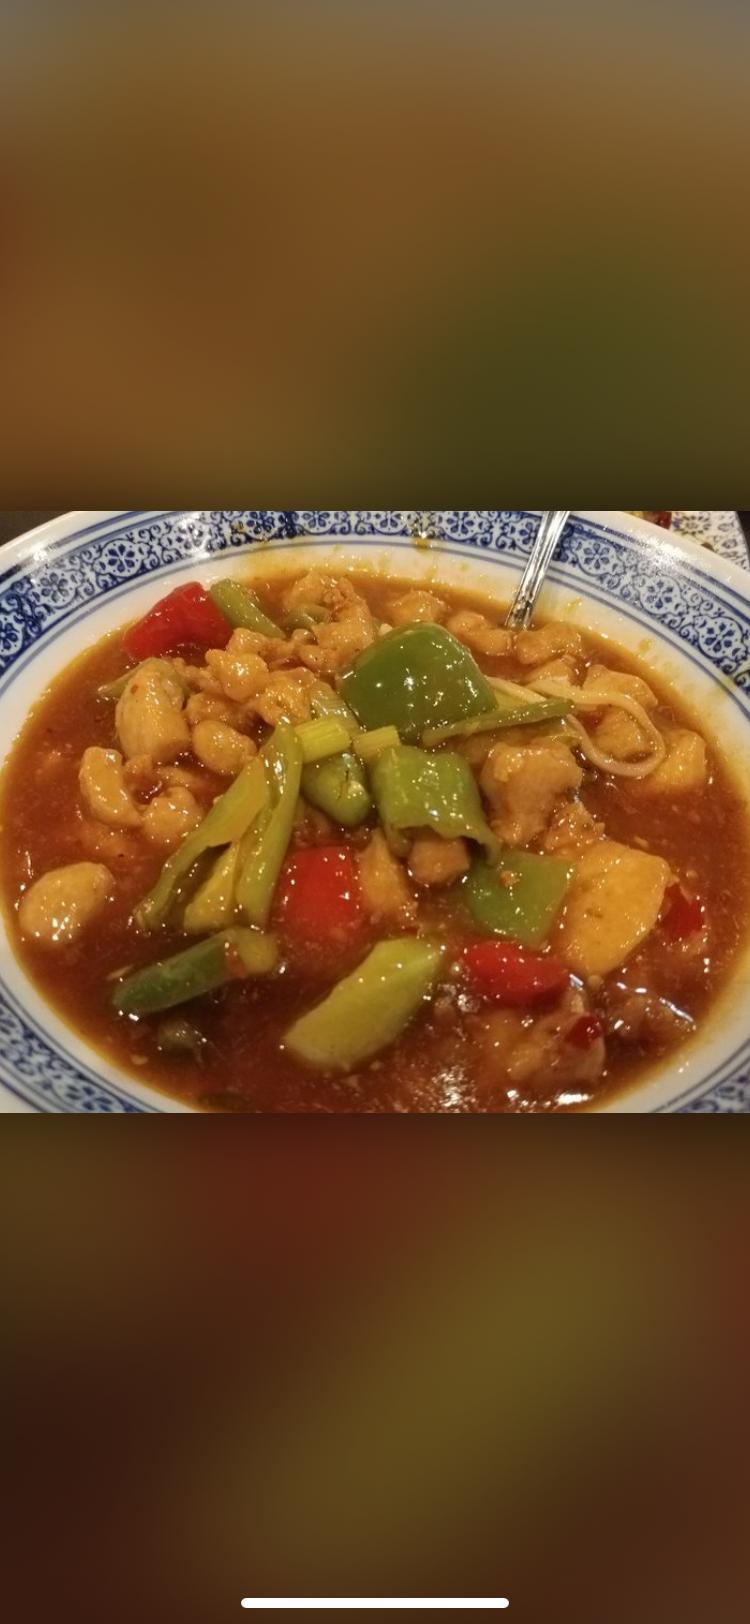 54. Double Pepper Chicken Noodle 双椒鸡丁面